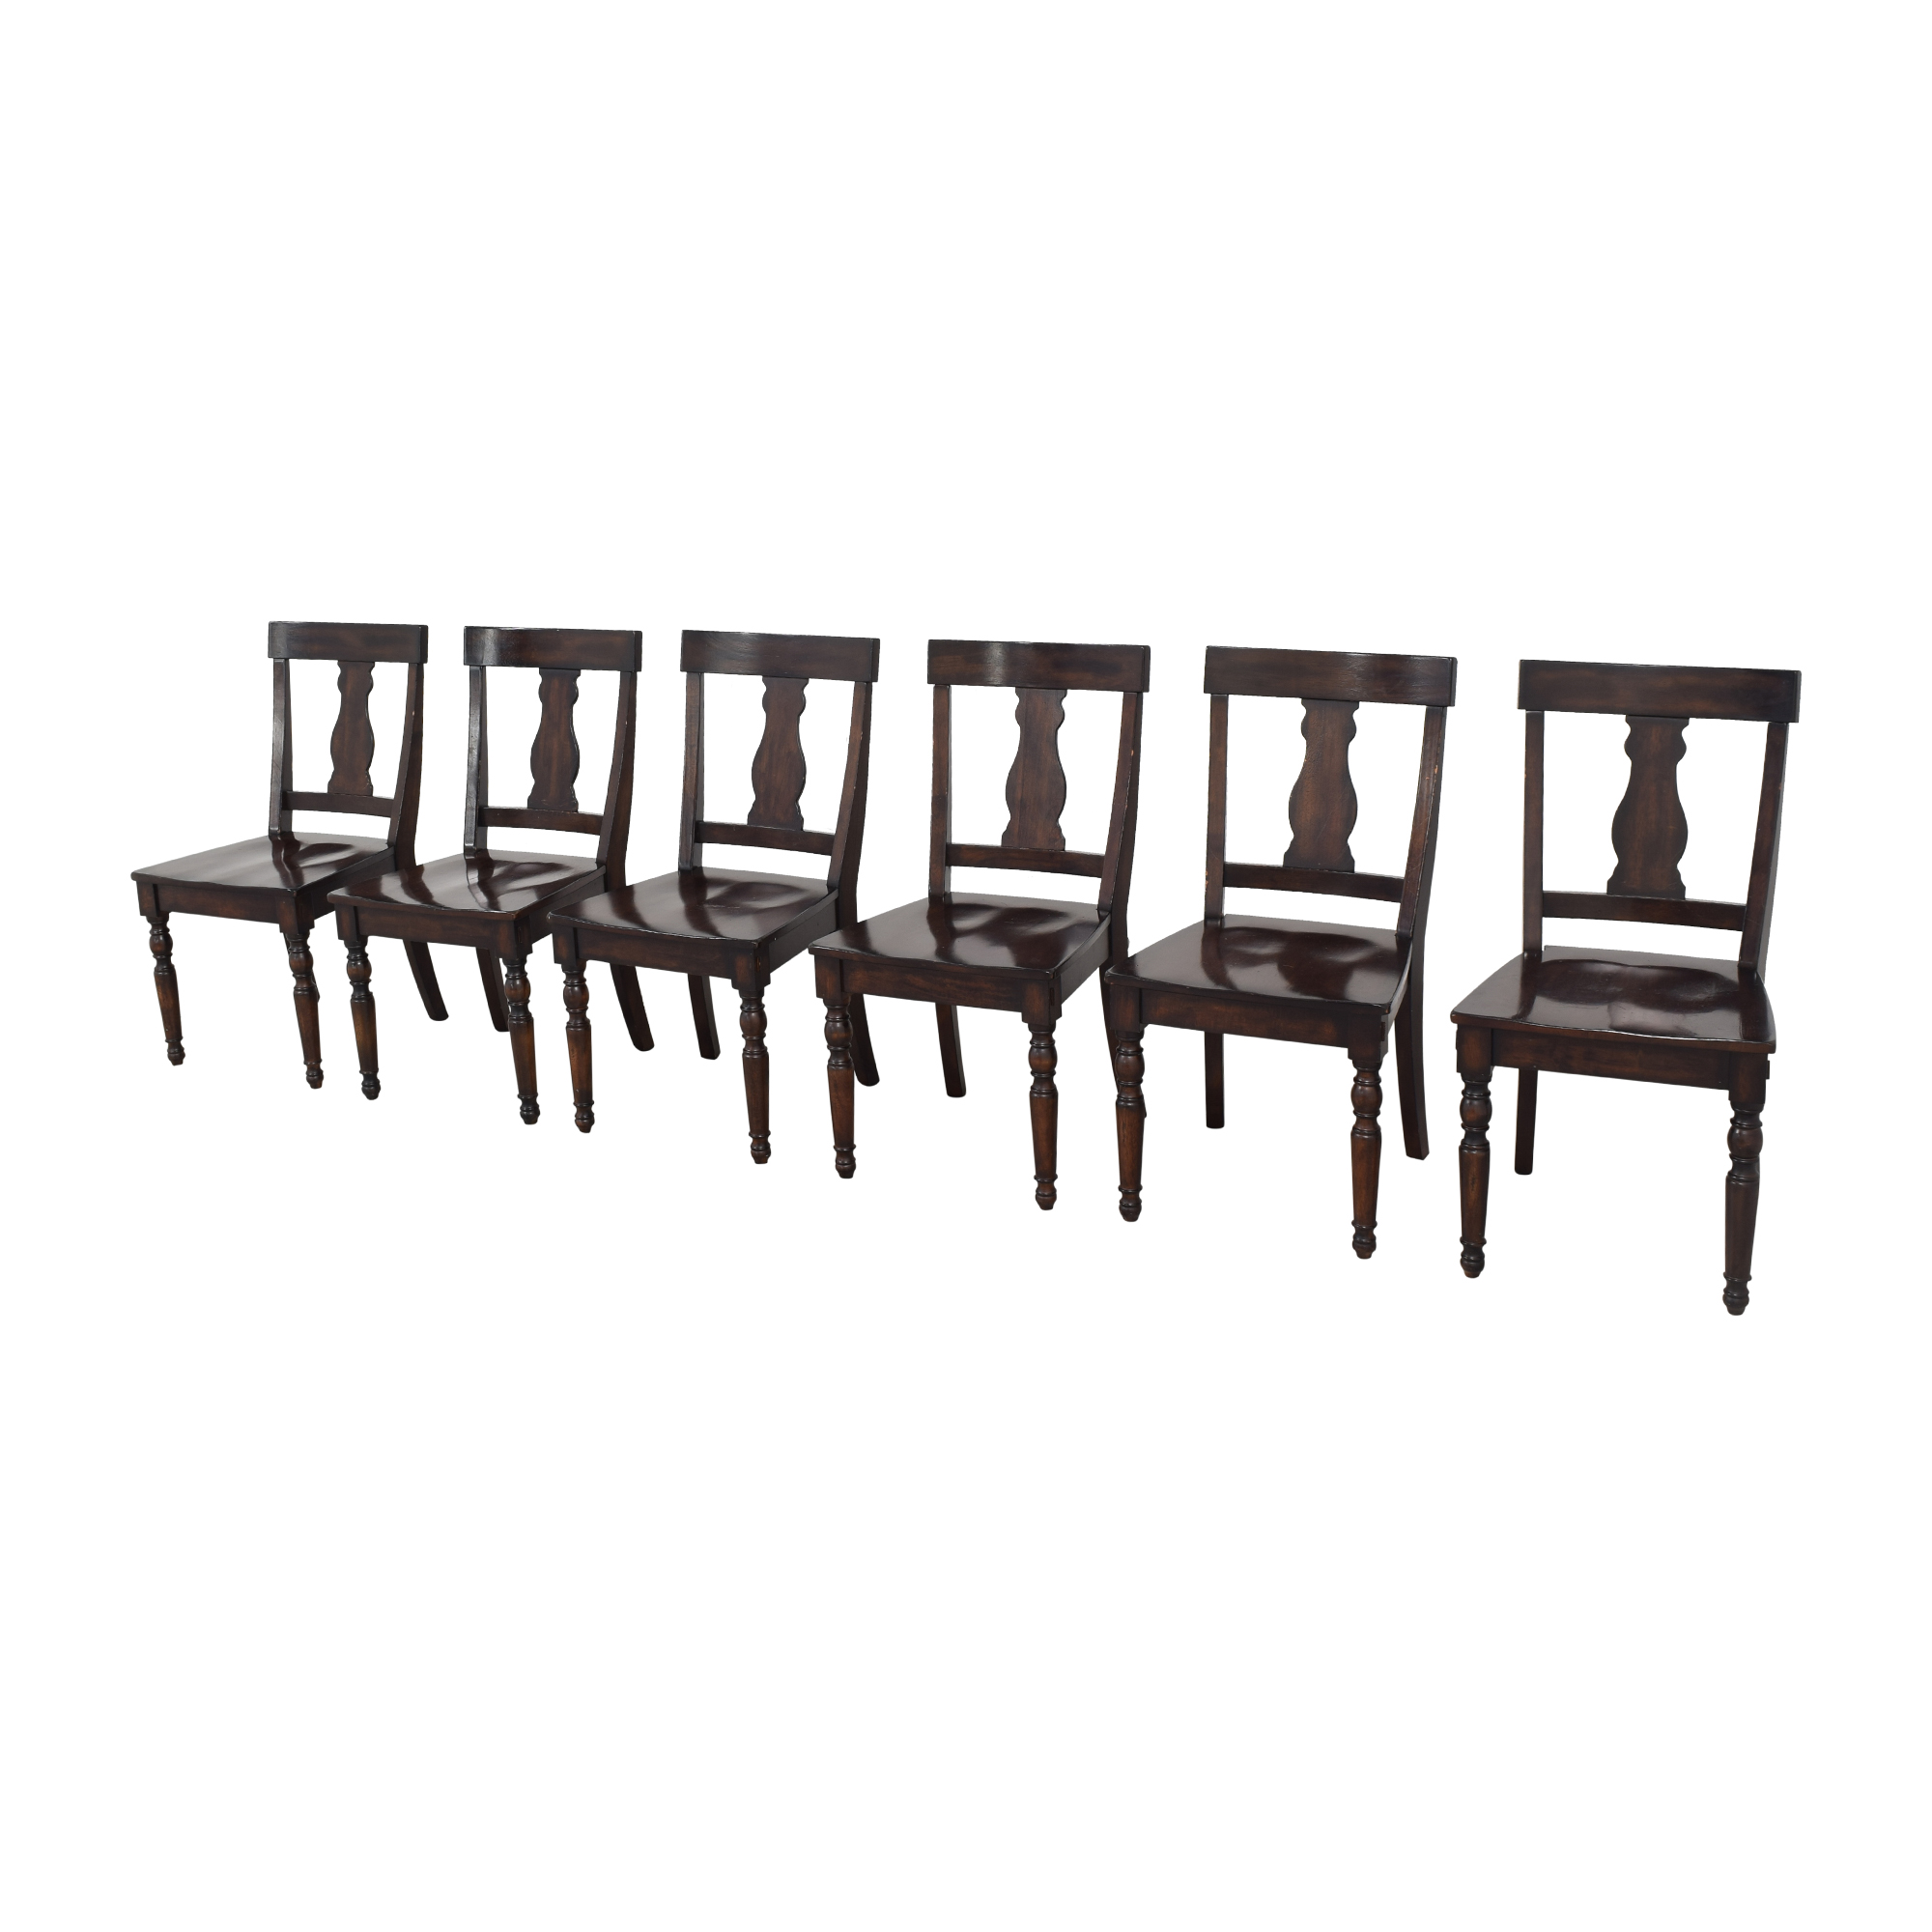 Pottery Barn Pottery Barn Fiddleback Dining Chairs nj